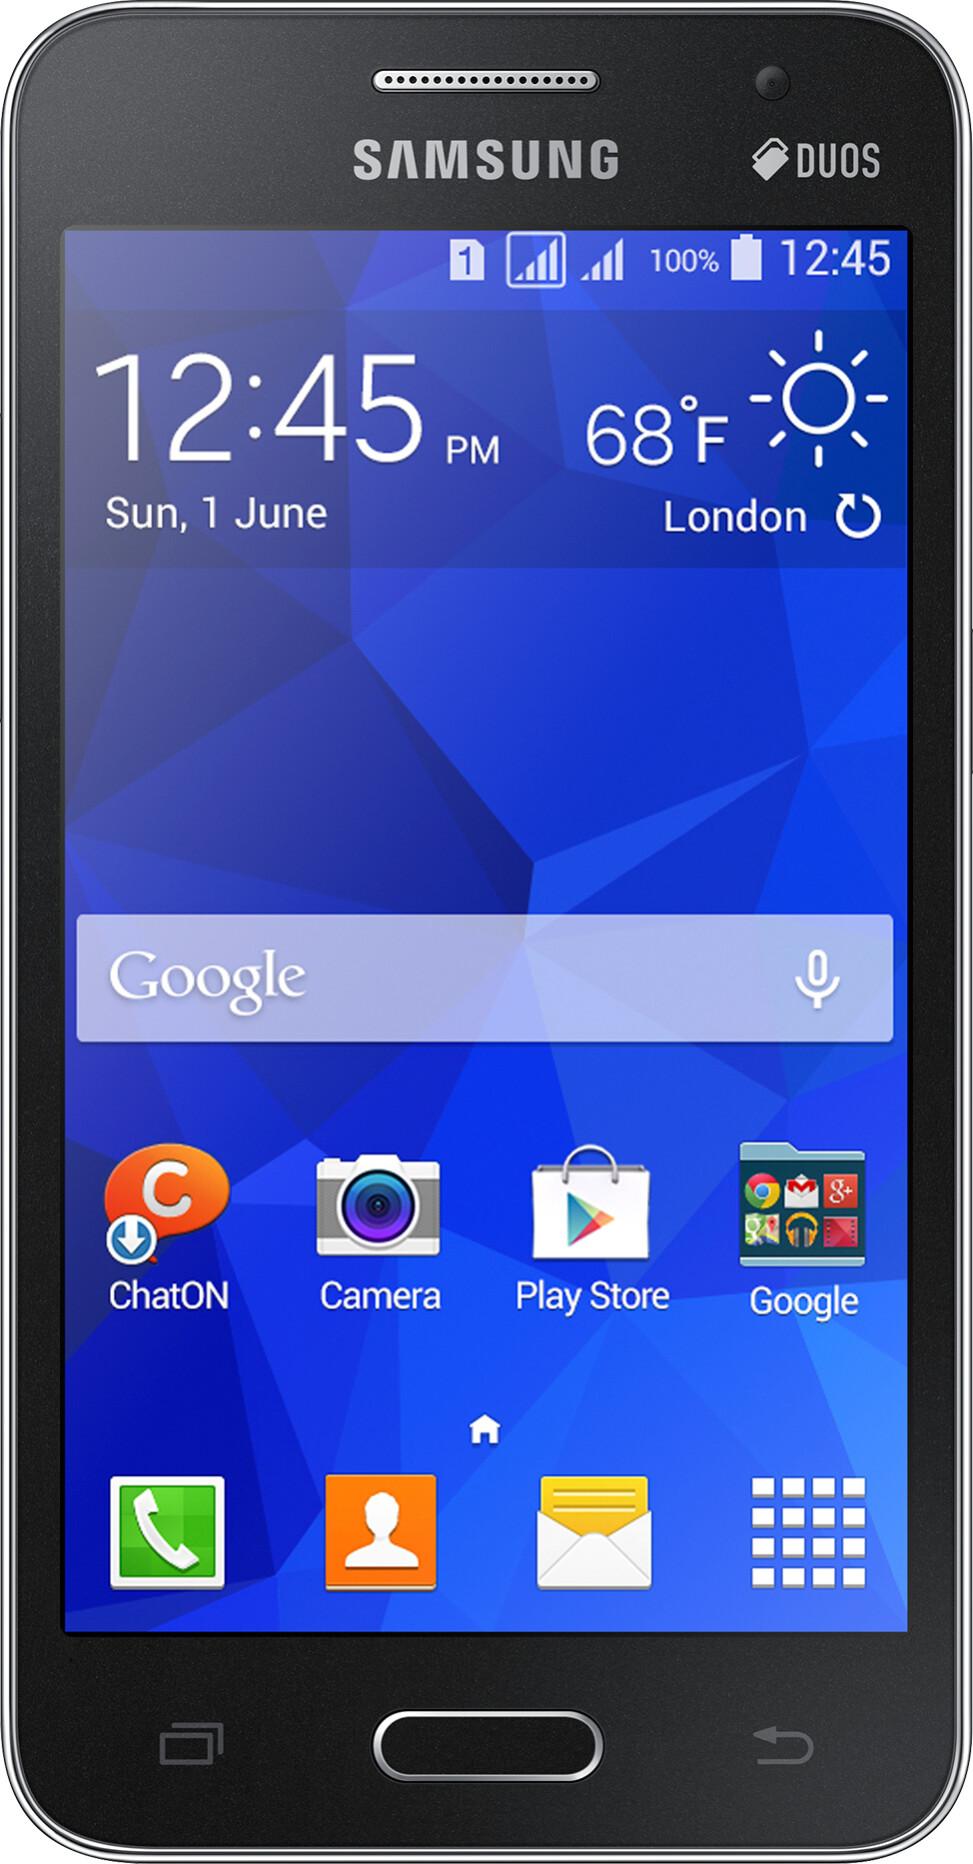 Samsung Galaxy S Duos details